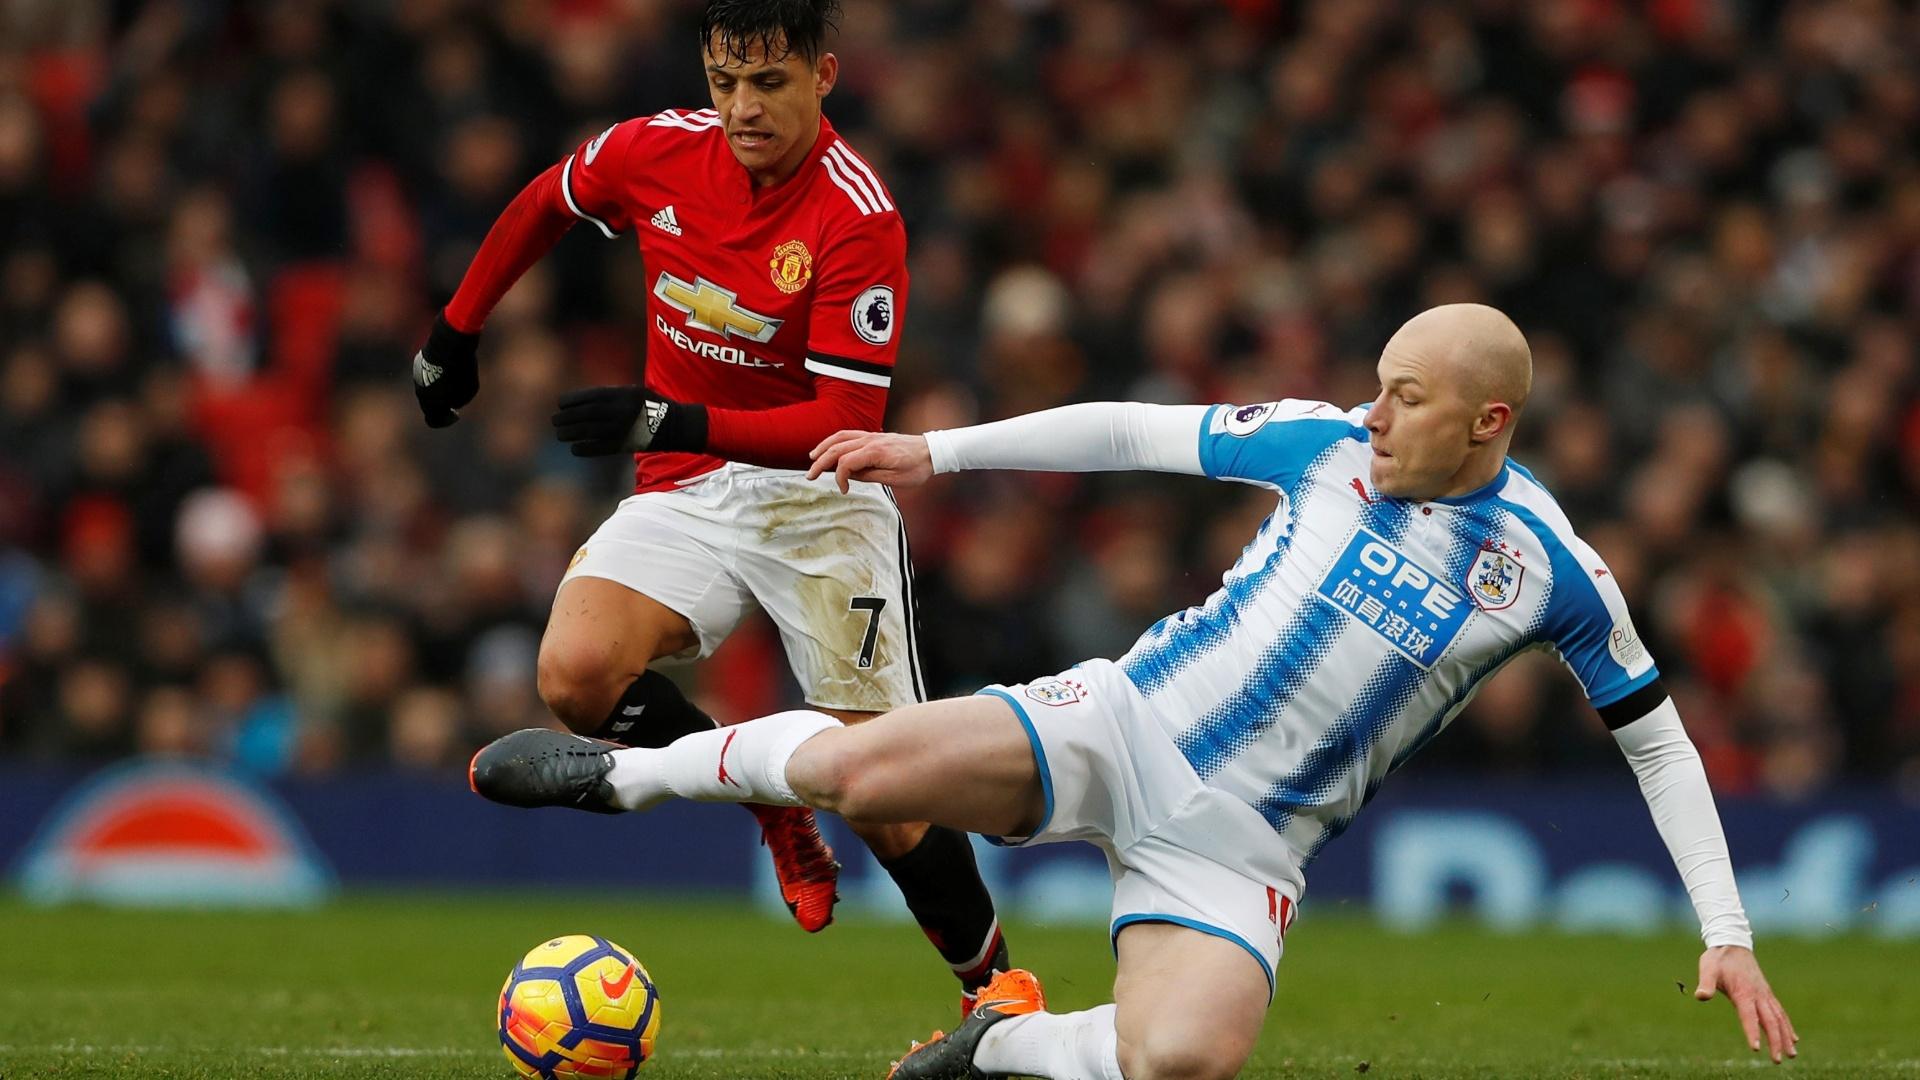 Sánchez tenta jogada individual na partida contra o Huddersfield